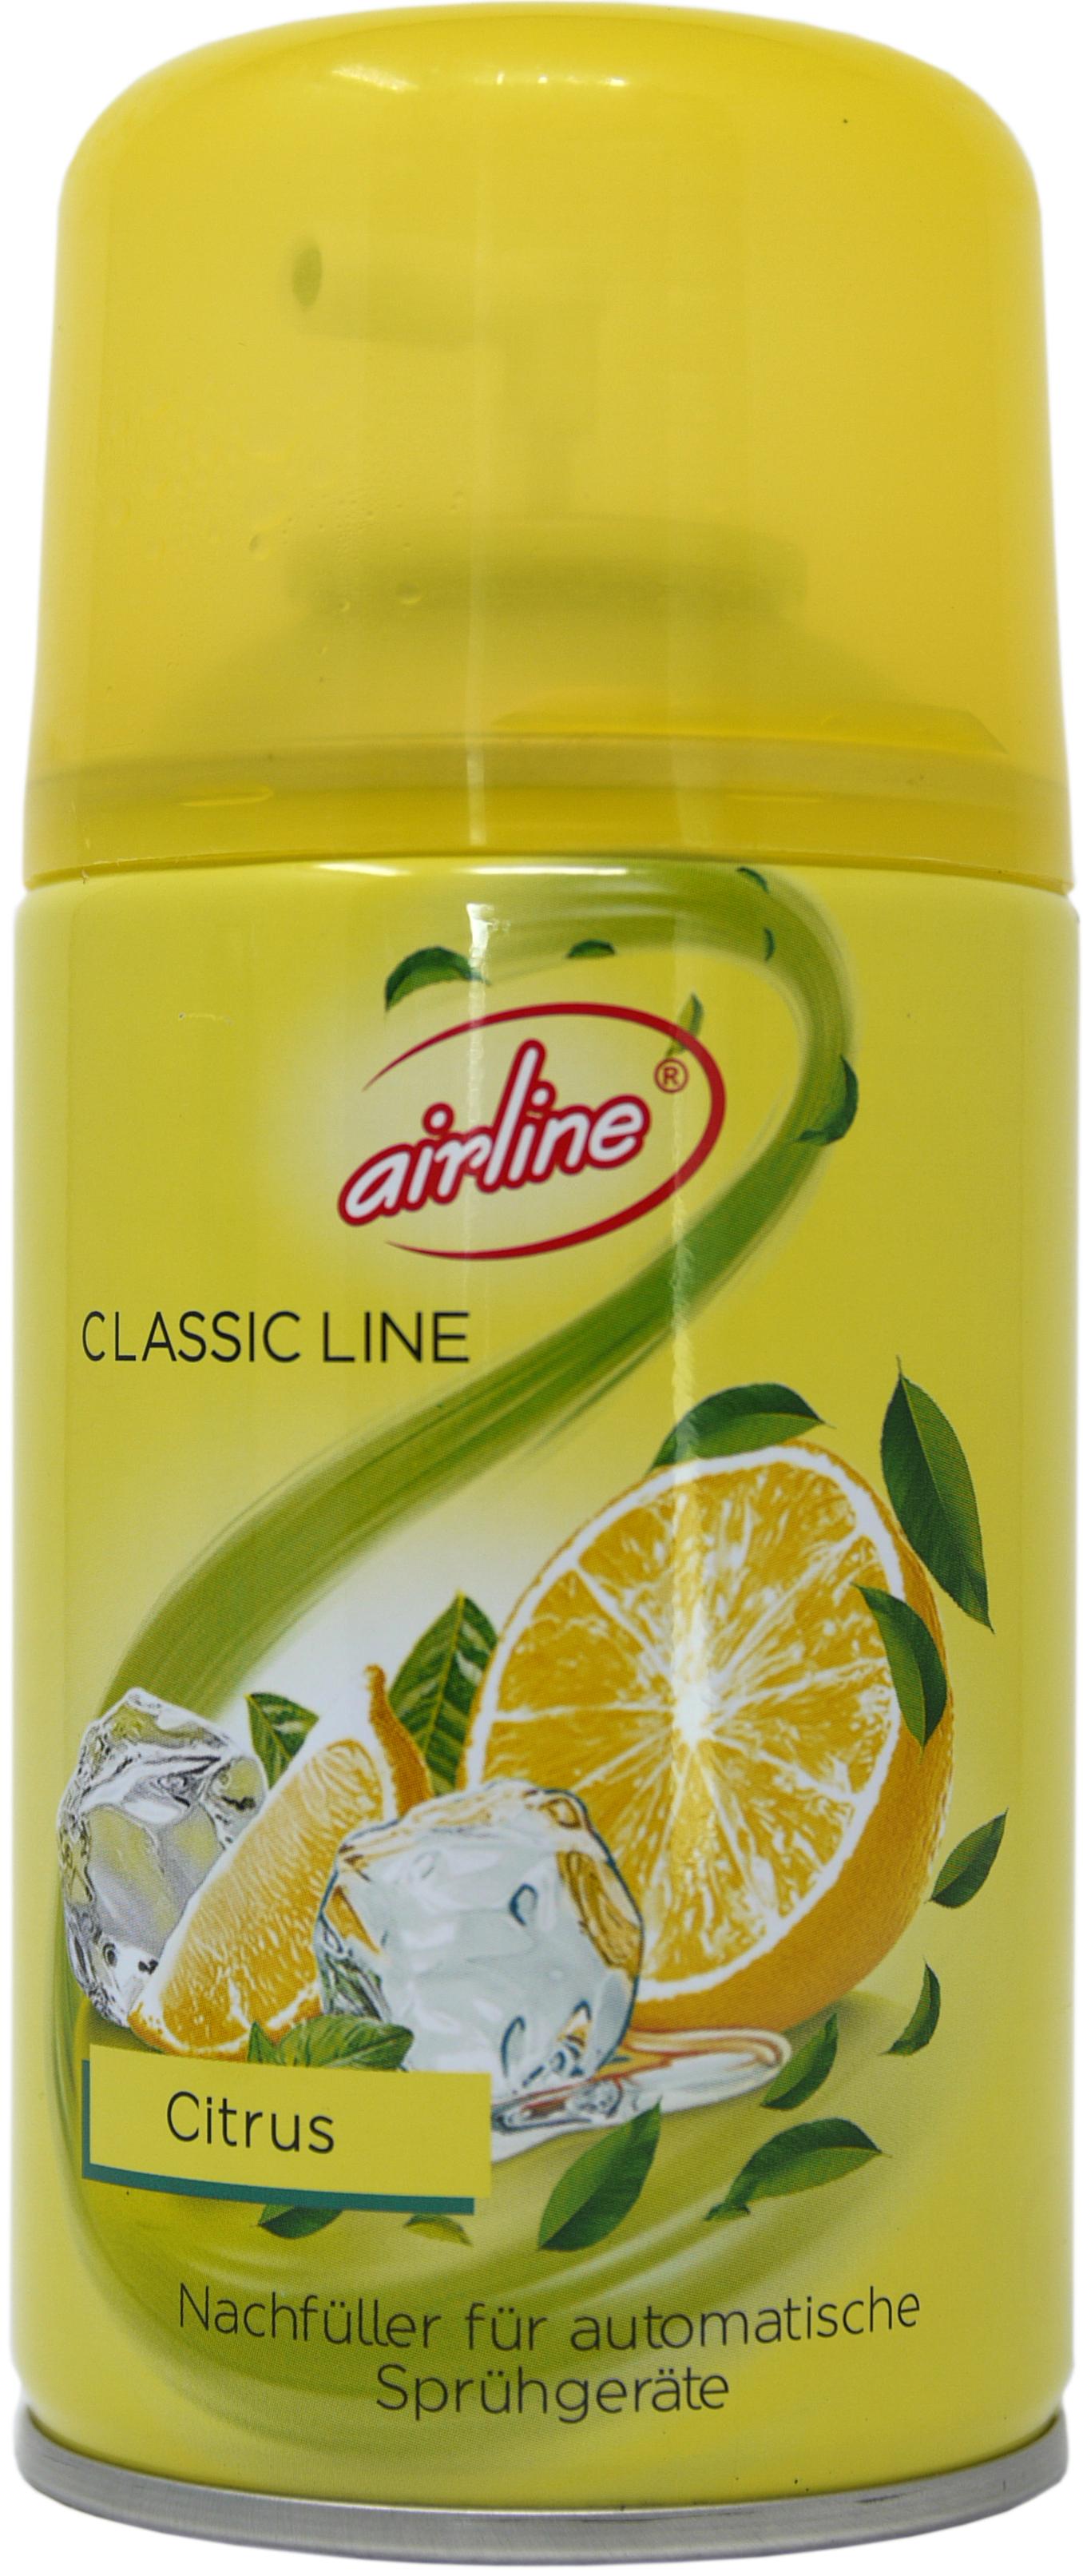 00505 - airline Classic Line Citrus Nachfüllkartusche 250 ml